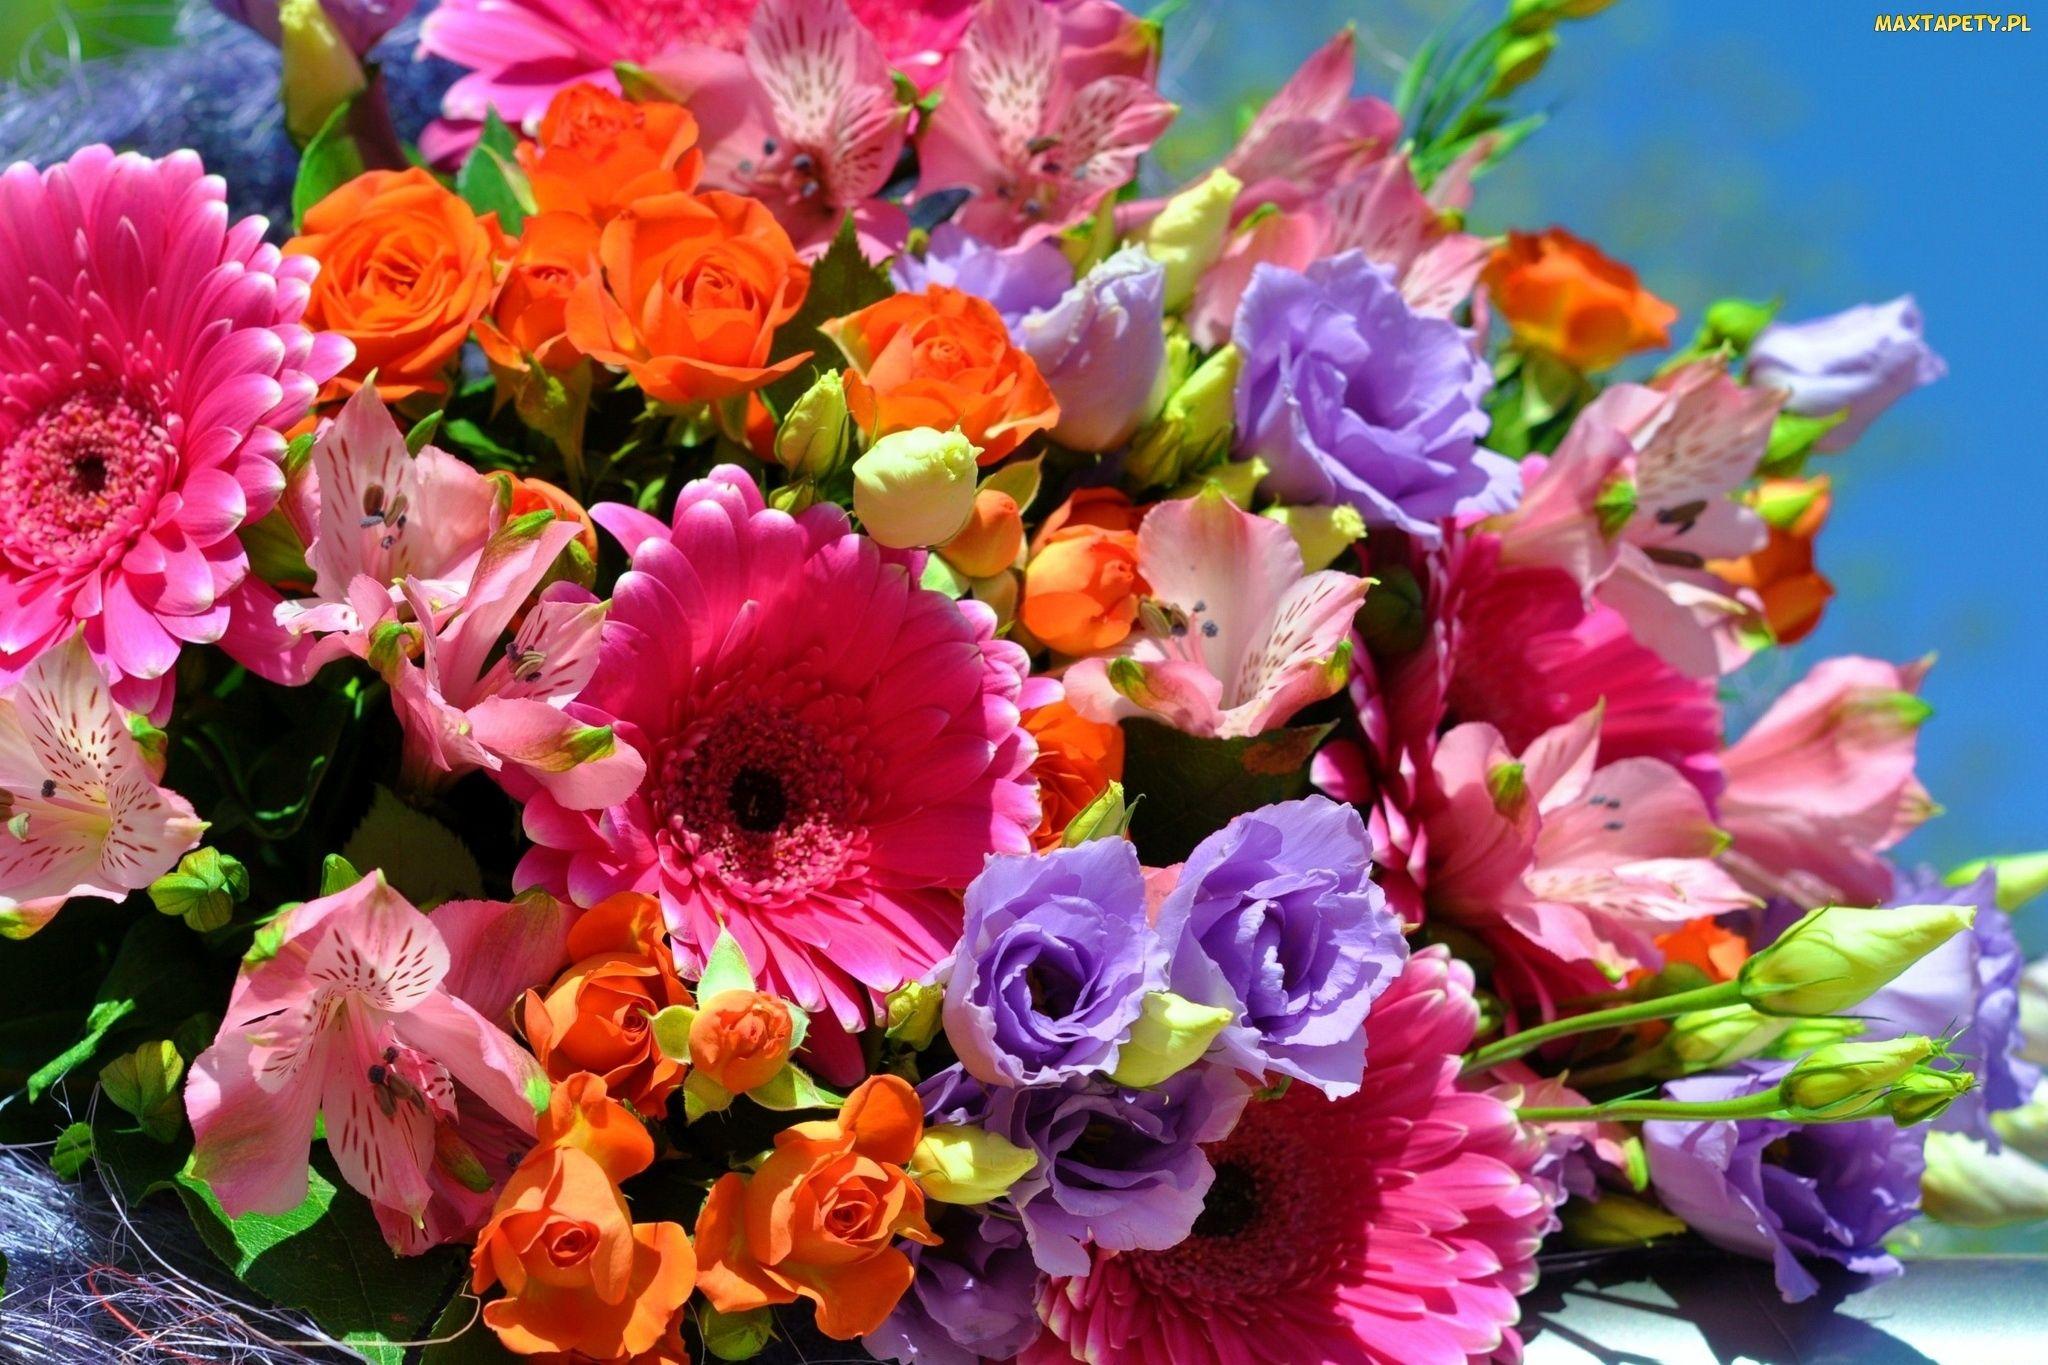 Kwiaty, Kolorowe, Bukiet